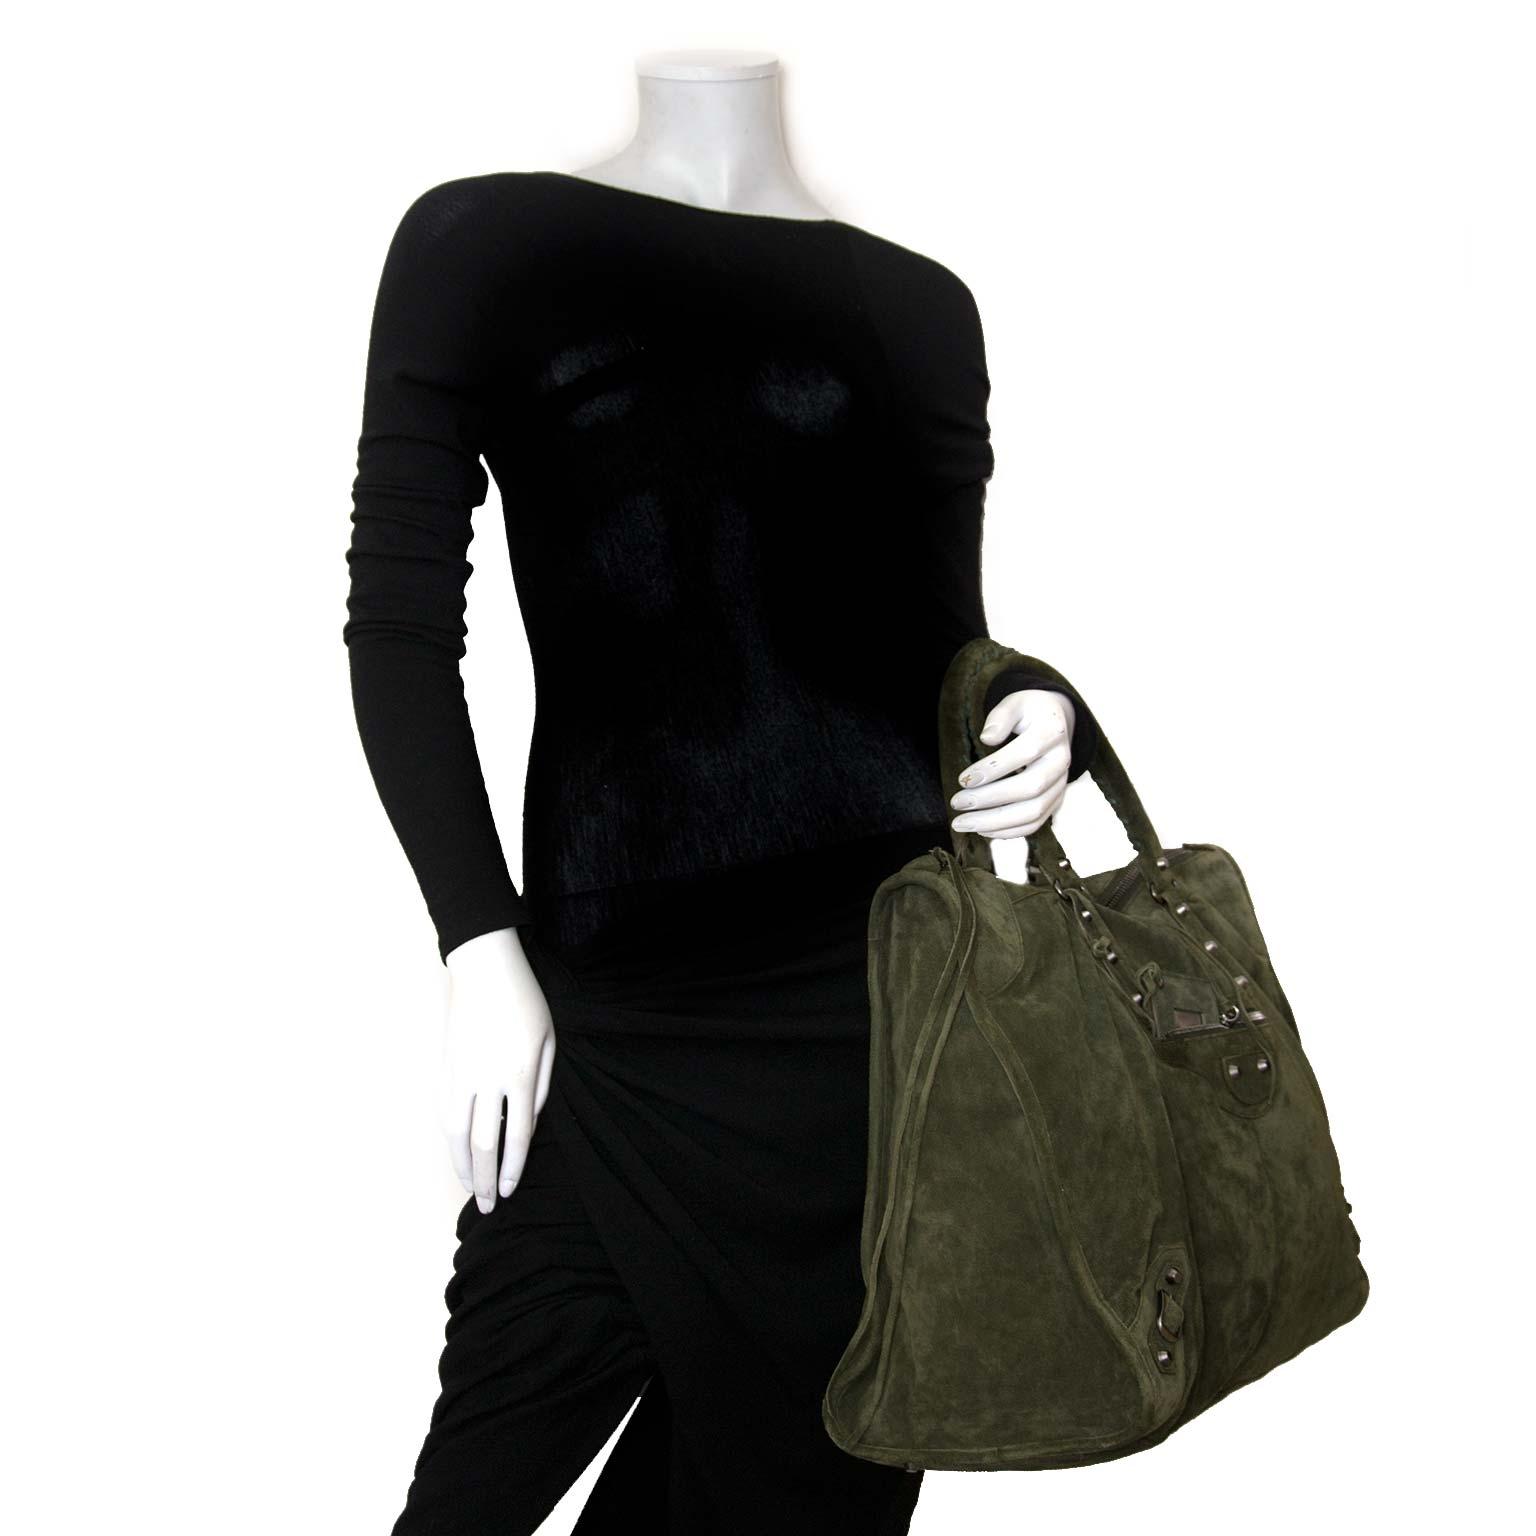 balenciaga khaki suede city weekender bag now for sale at labellov vintage fashion webshop belgium